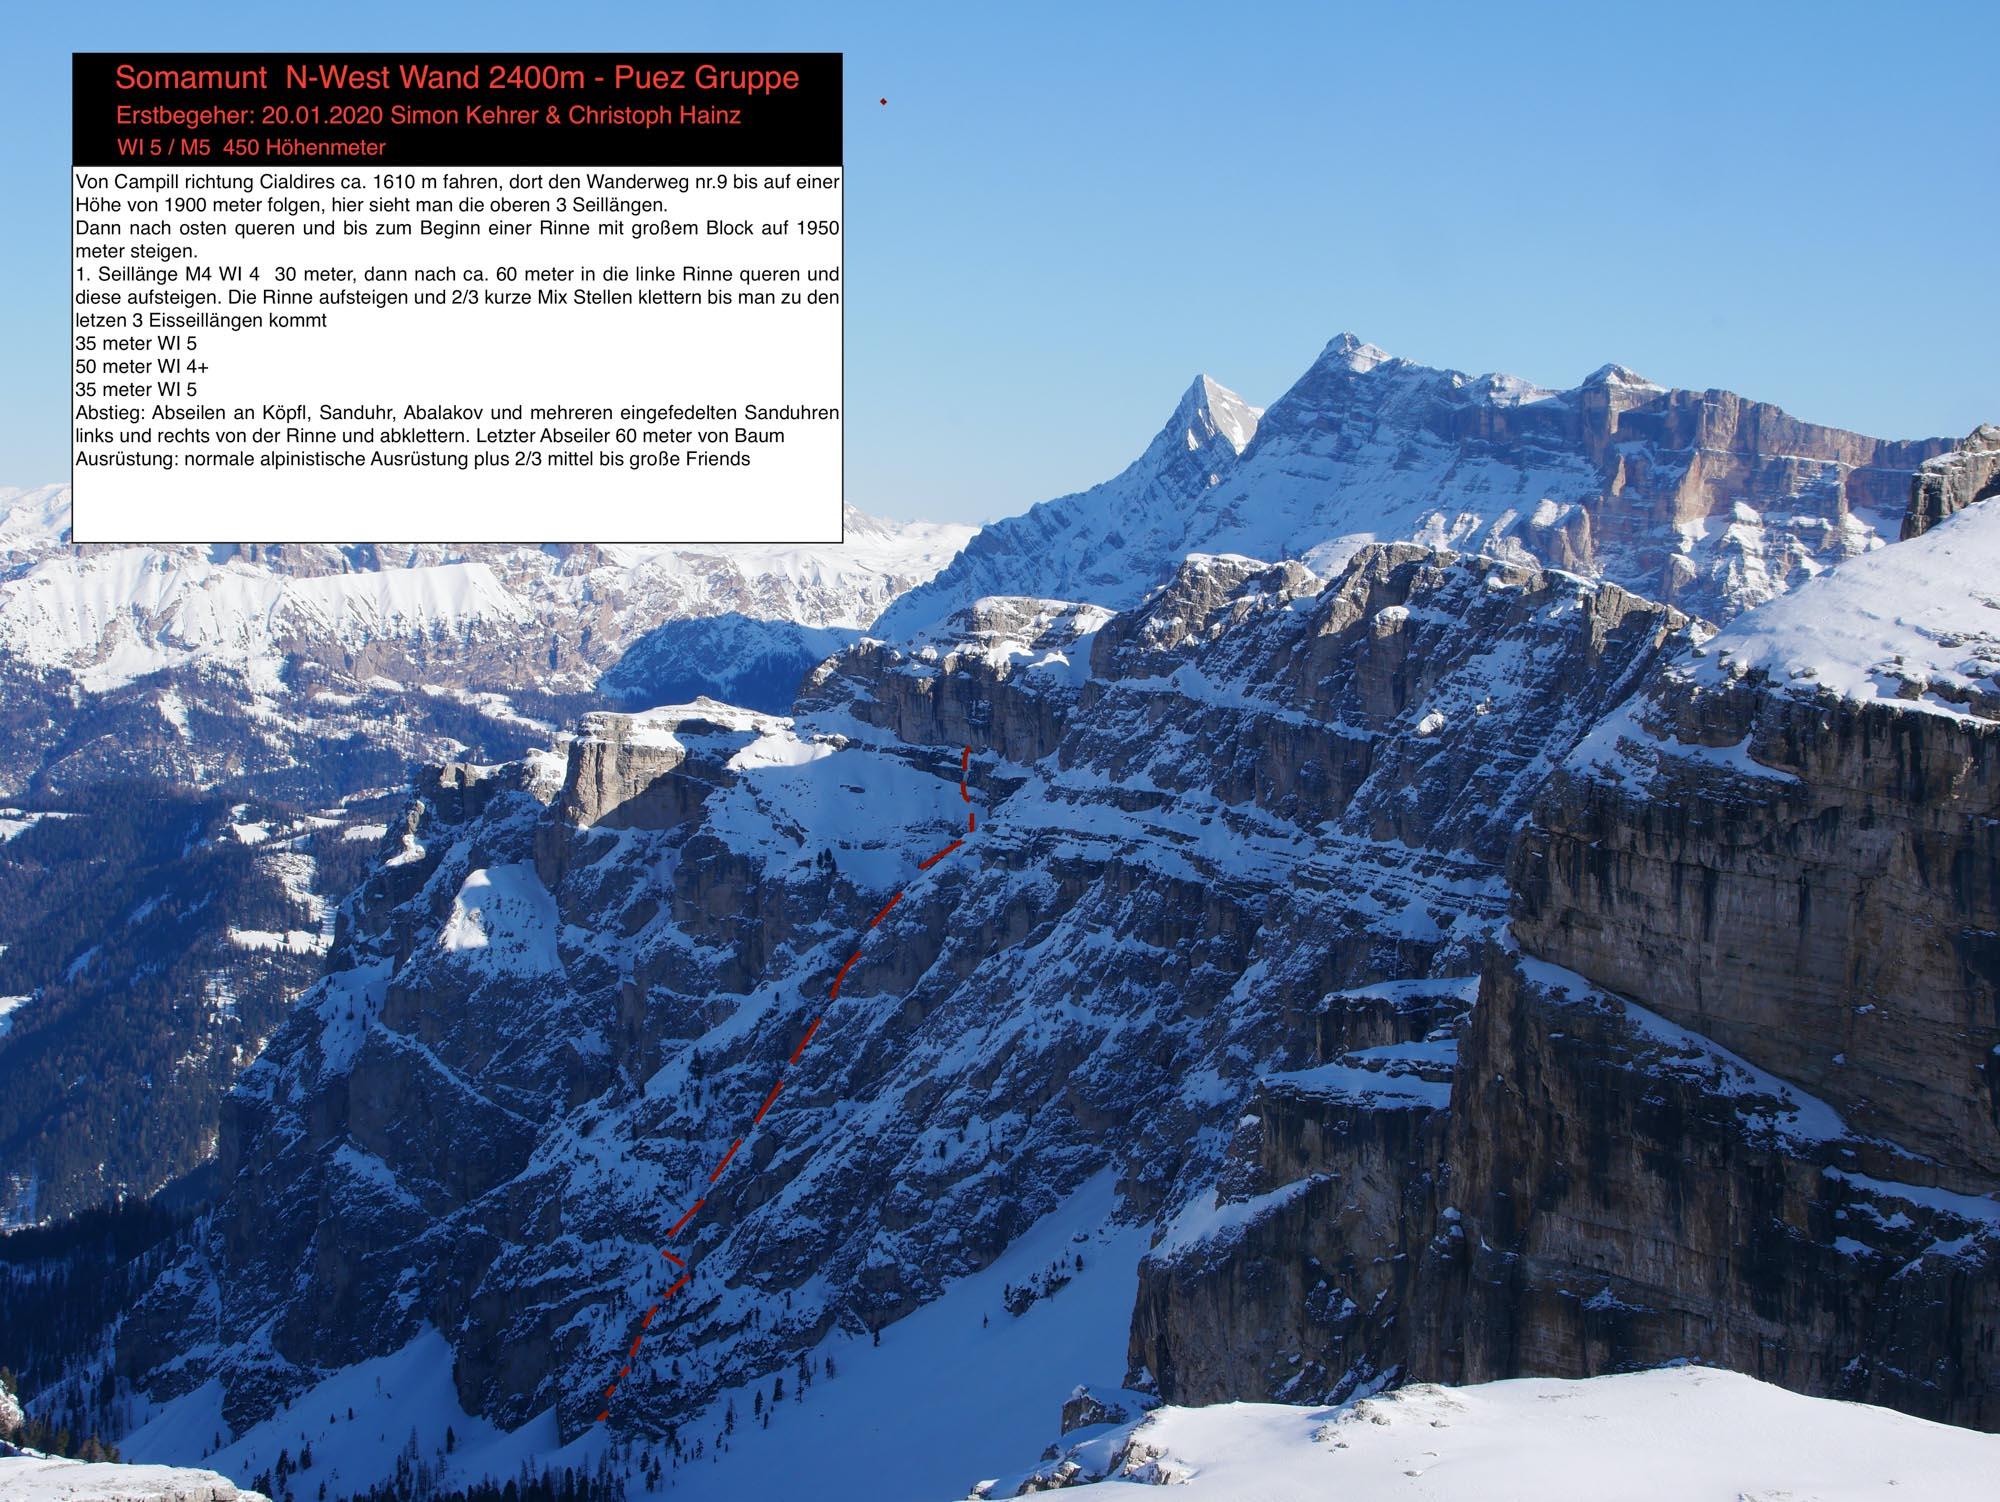 """Somamunt N-Westwand (WI5/M5)"" Puez Gruppe, Alta Badia"